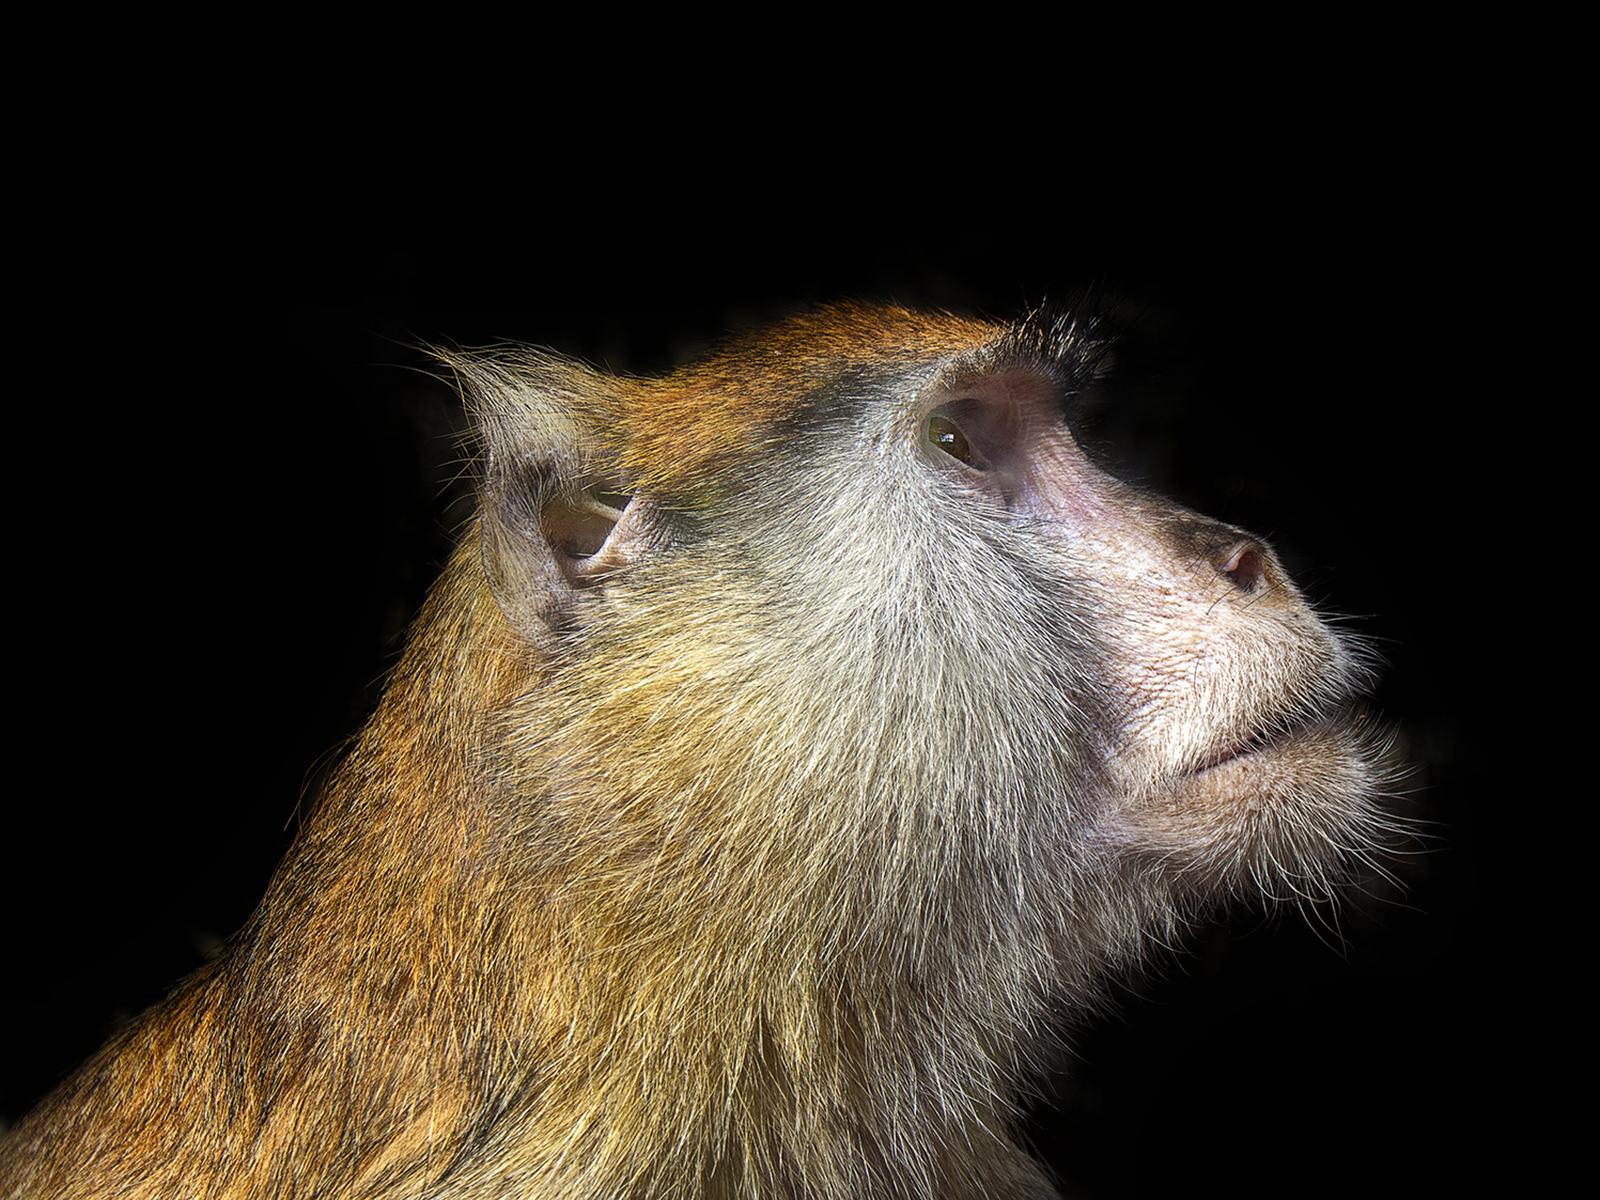 Macague monkey